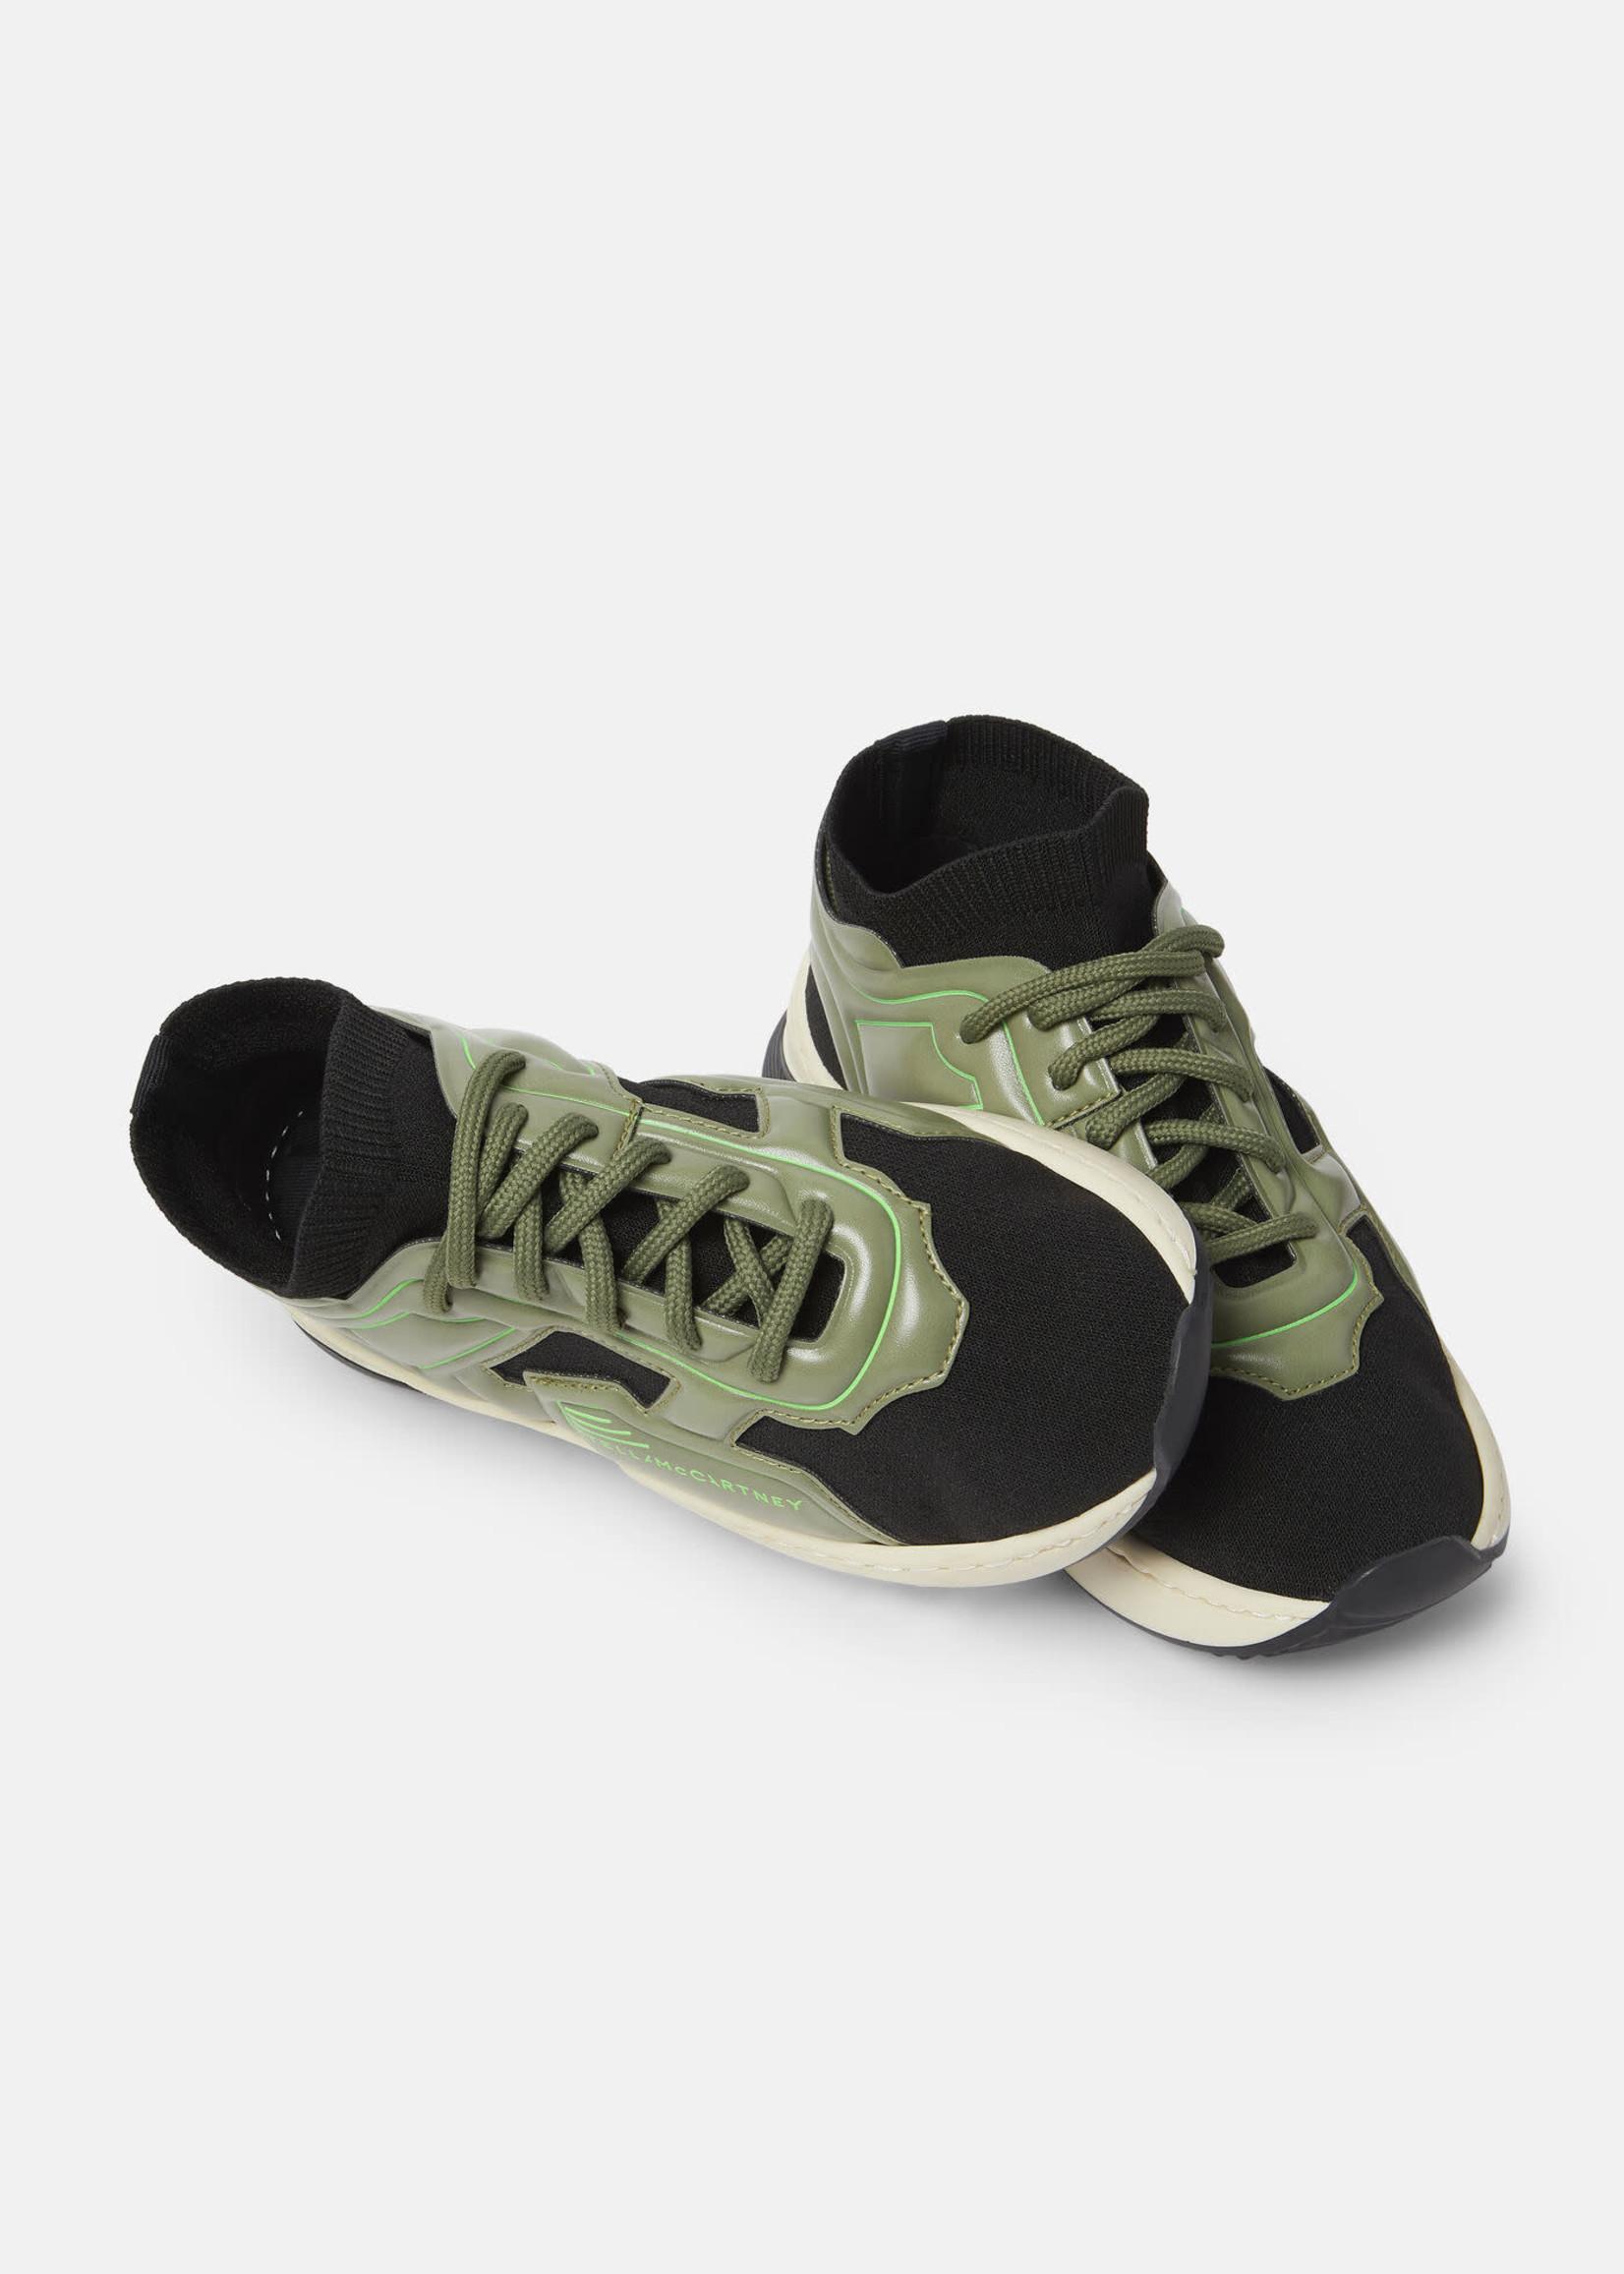 Stella McCartney Stella Mccartney-AW21 603394 Knit Sock Sport Trainers